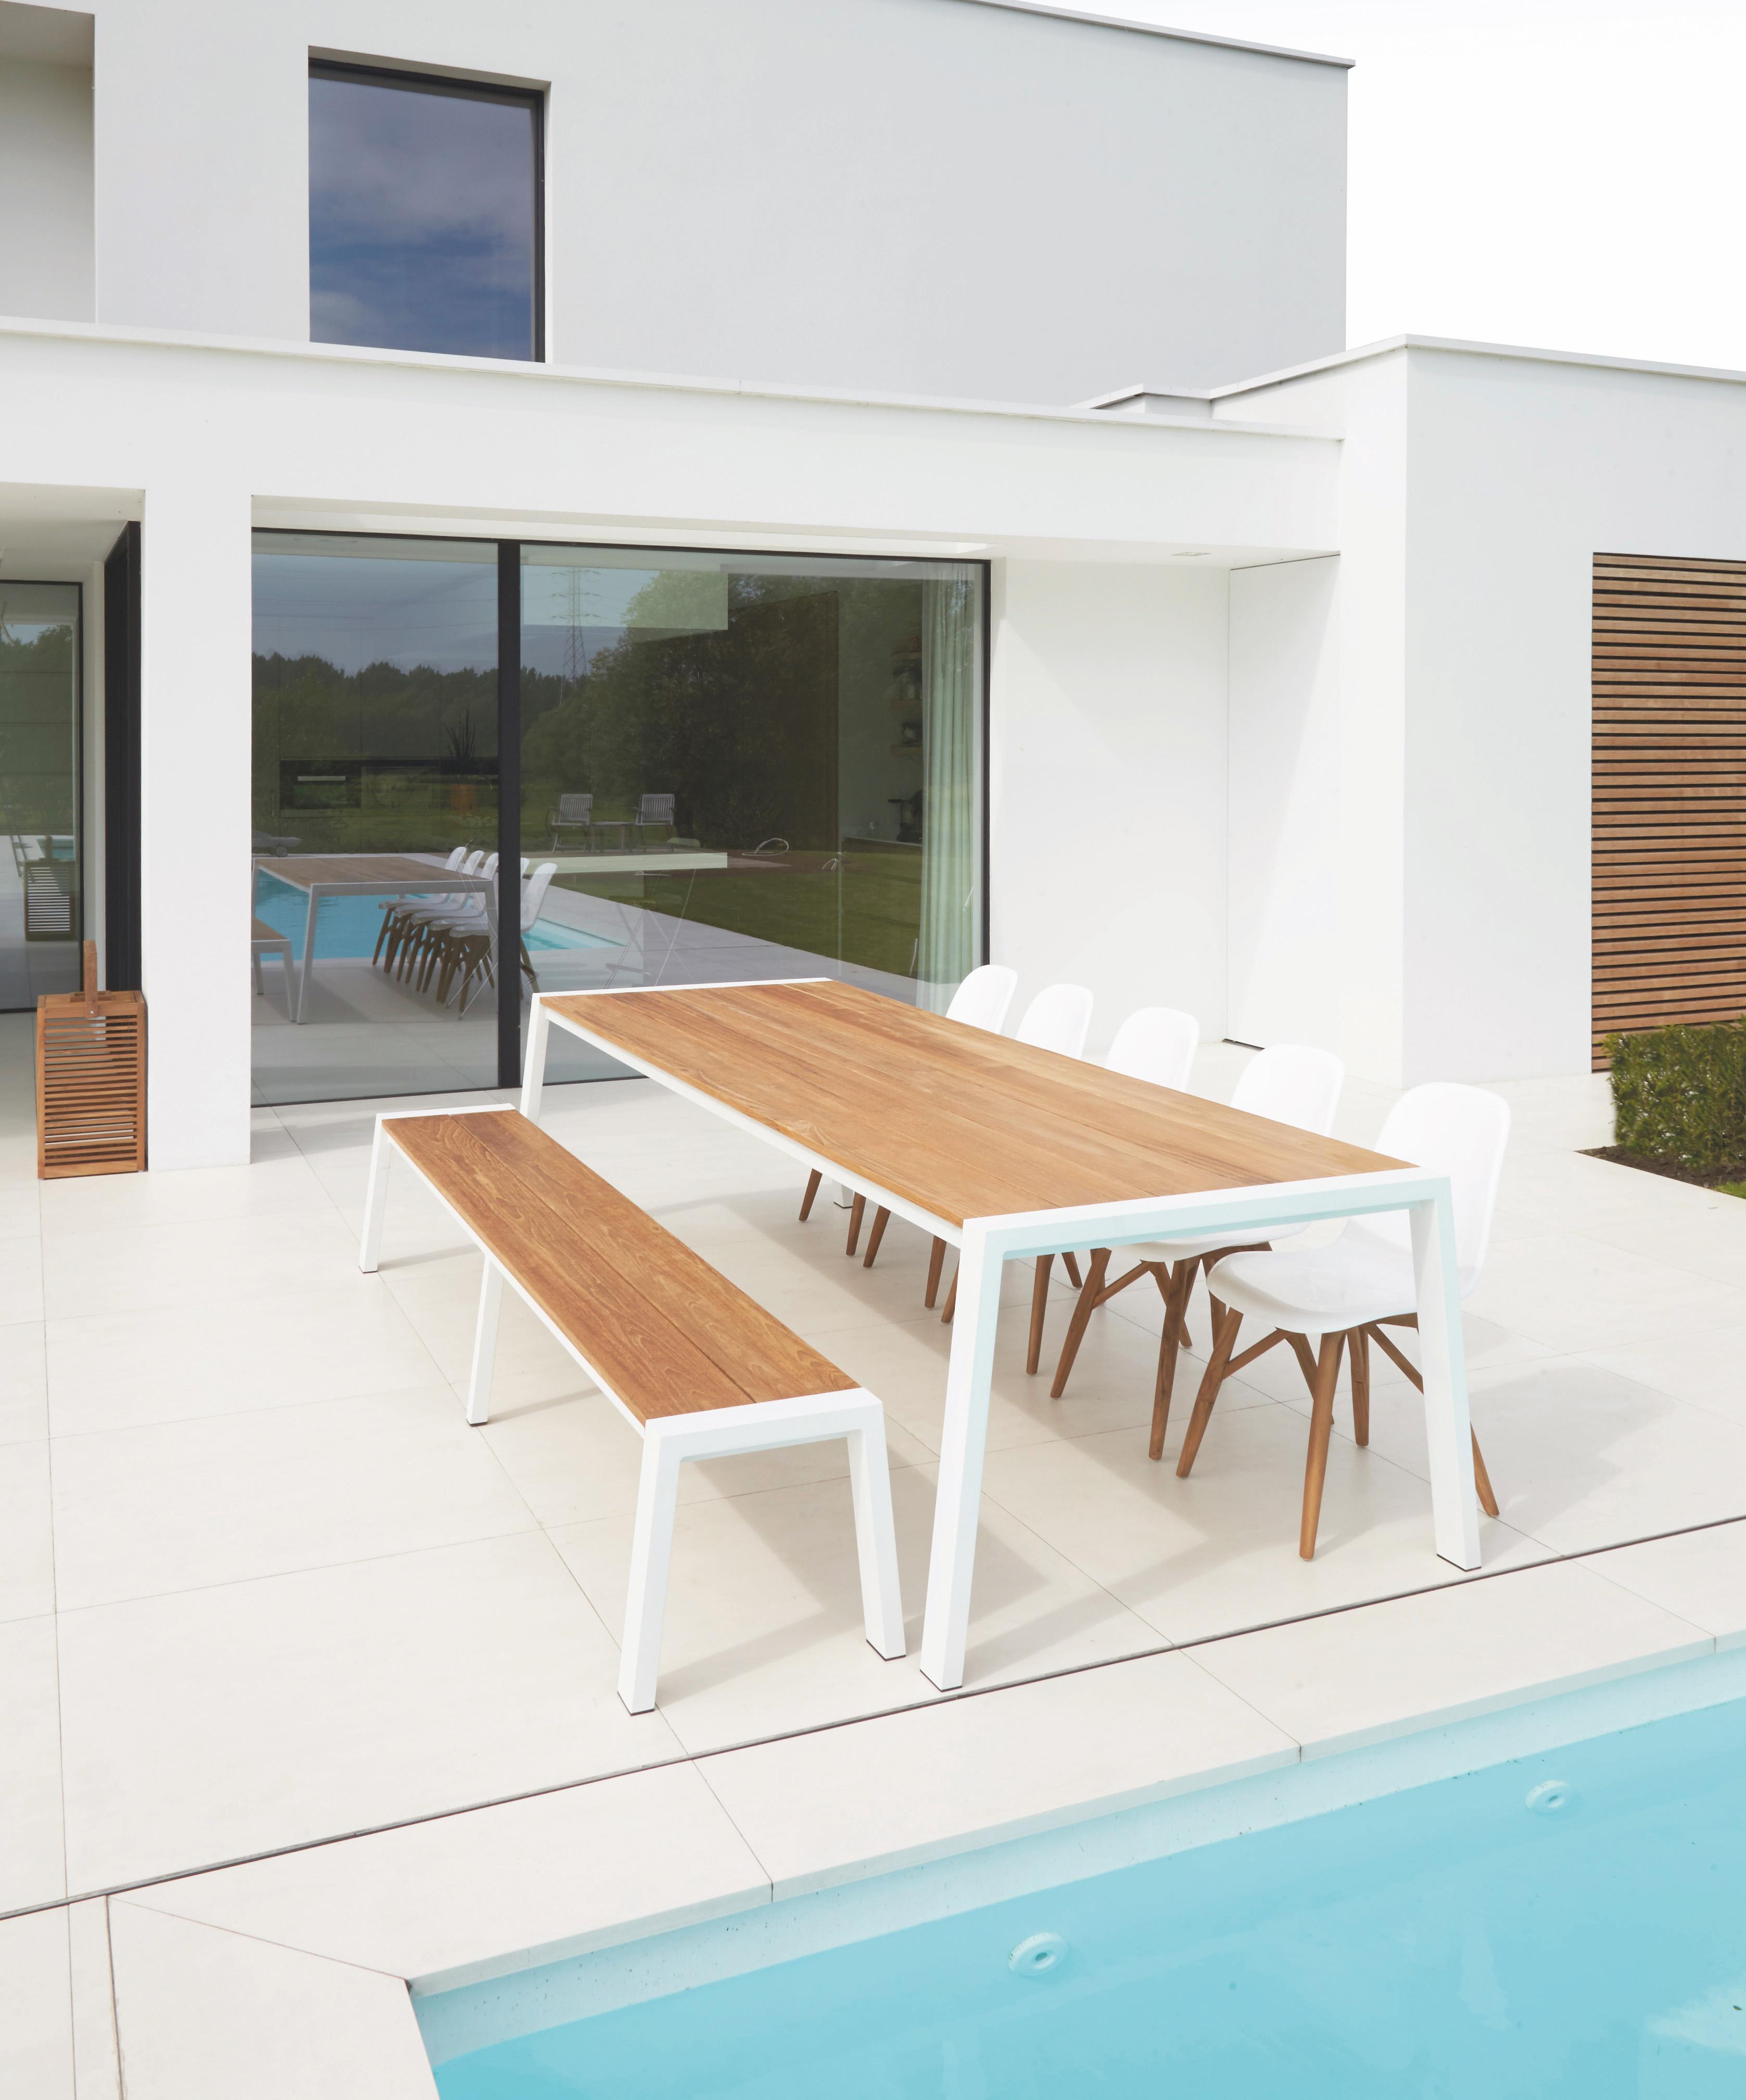 Bermuda Dining Table Luxury Modern Farm House Outdoor Furniture Teak  Aluminum XL Table 12 People